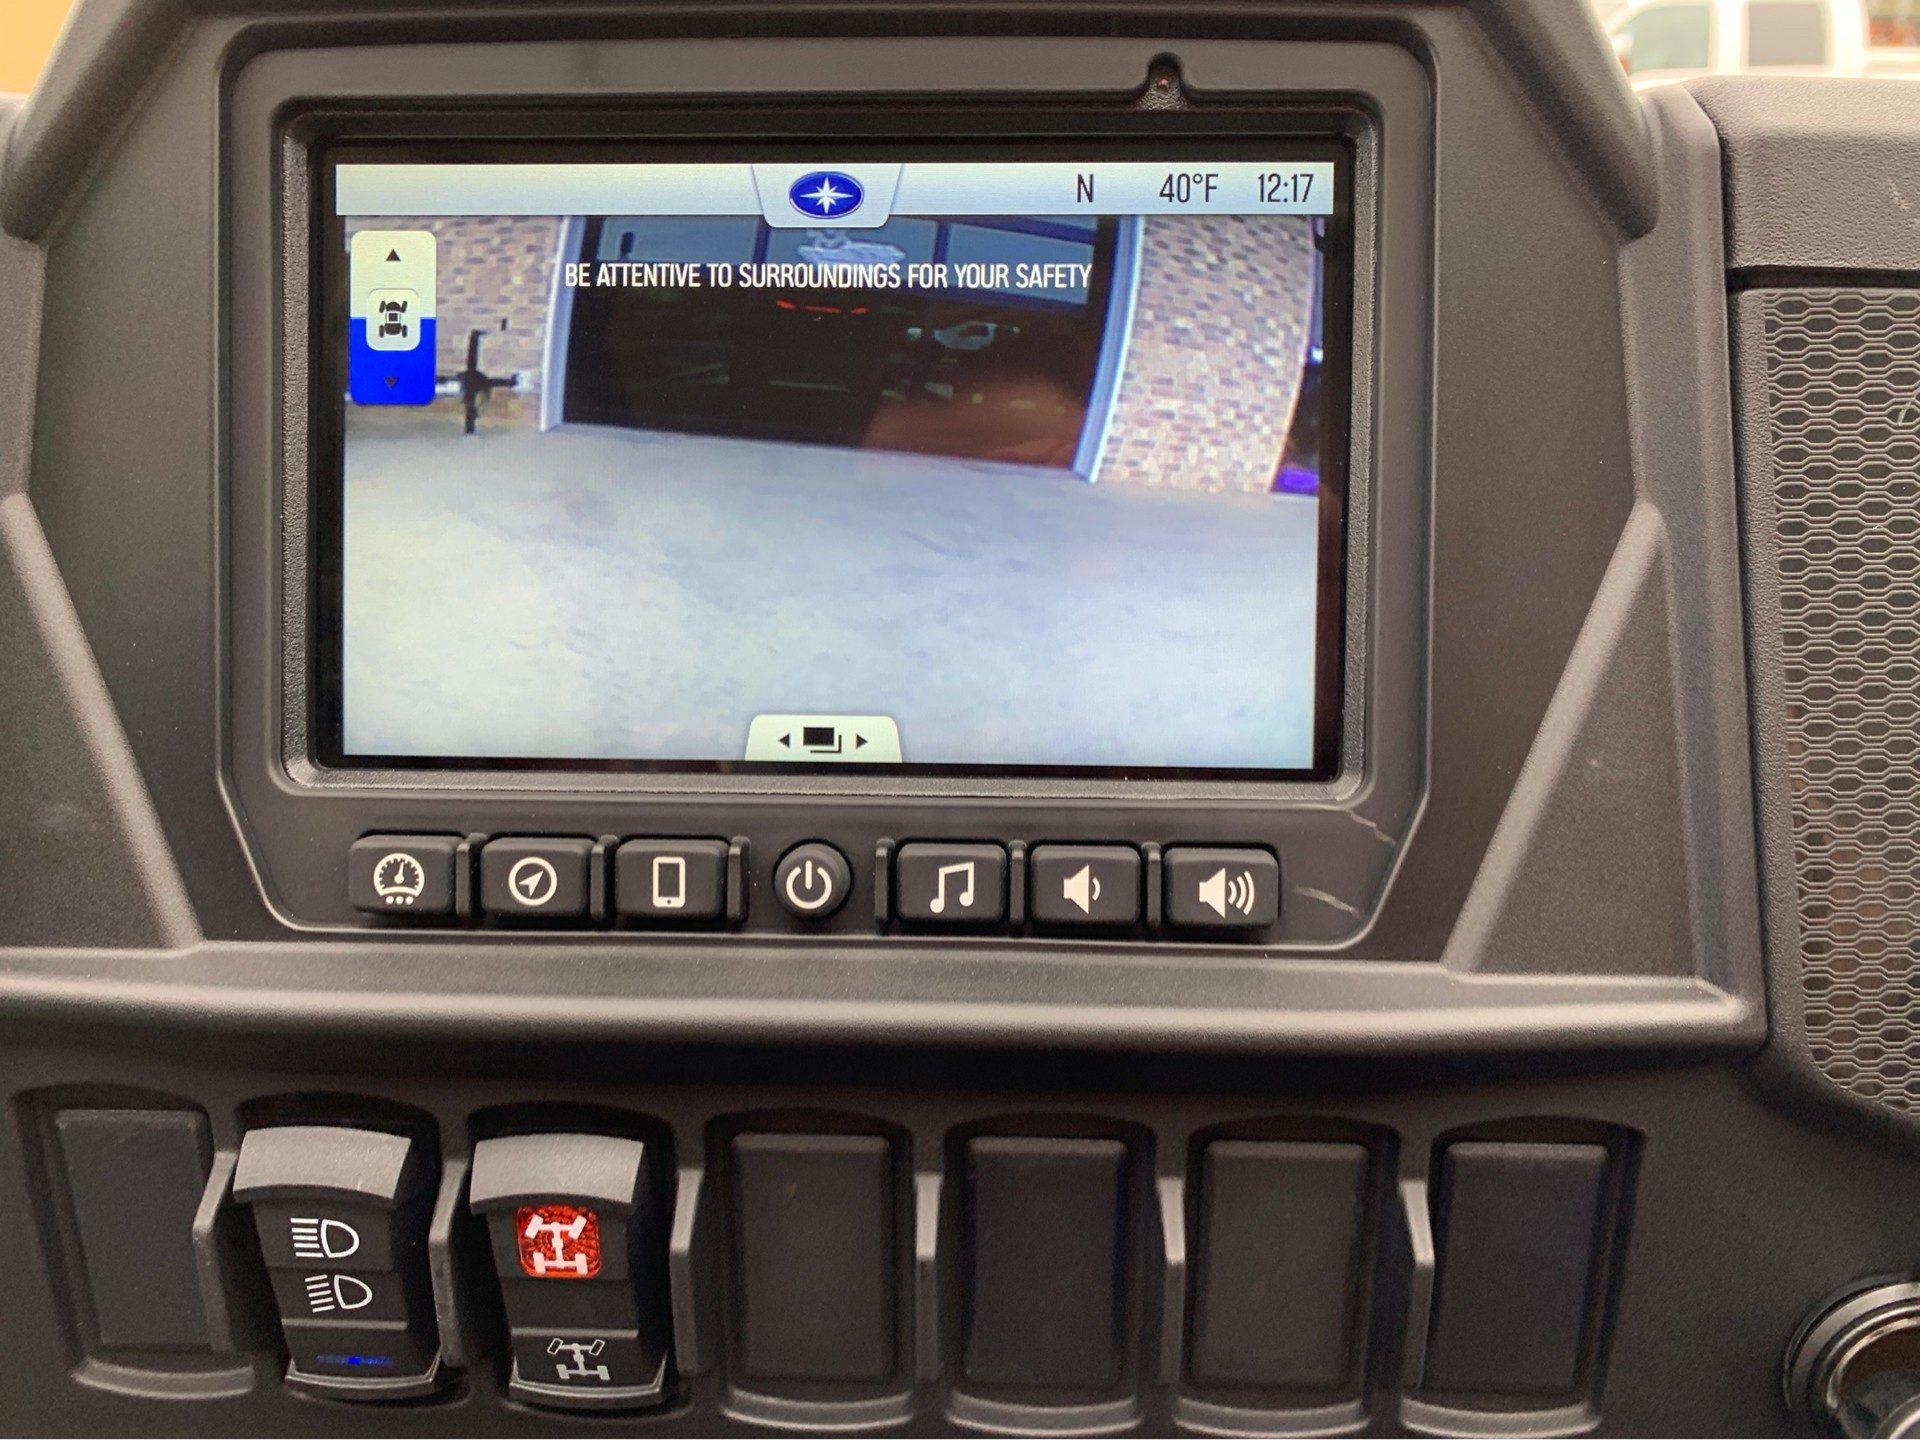 New 2019 Polaris RZR XP 1000 Ride Command Utility Vehicles